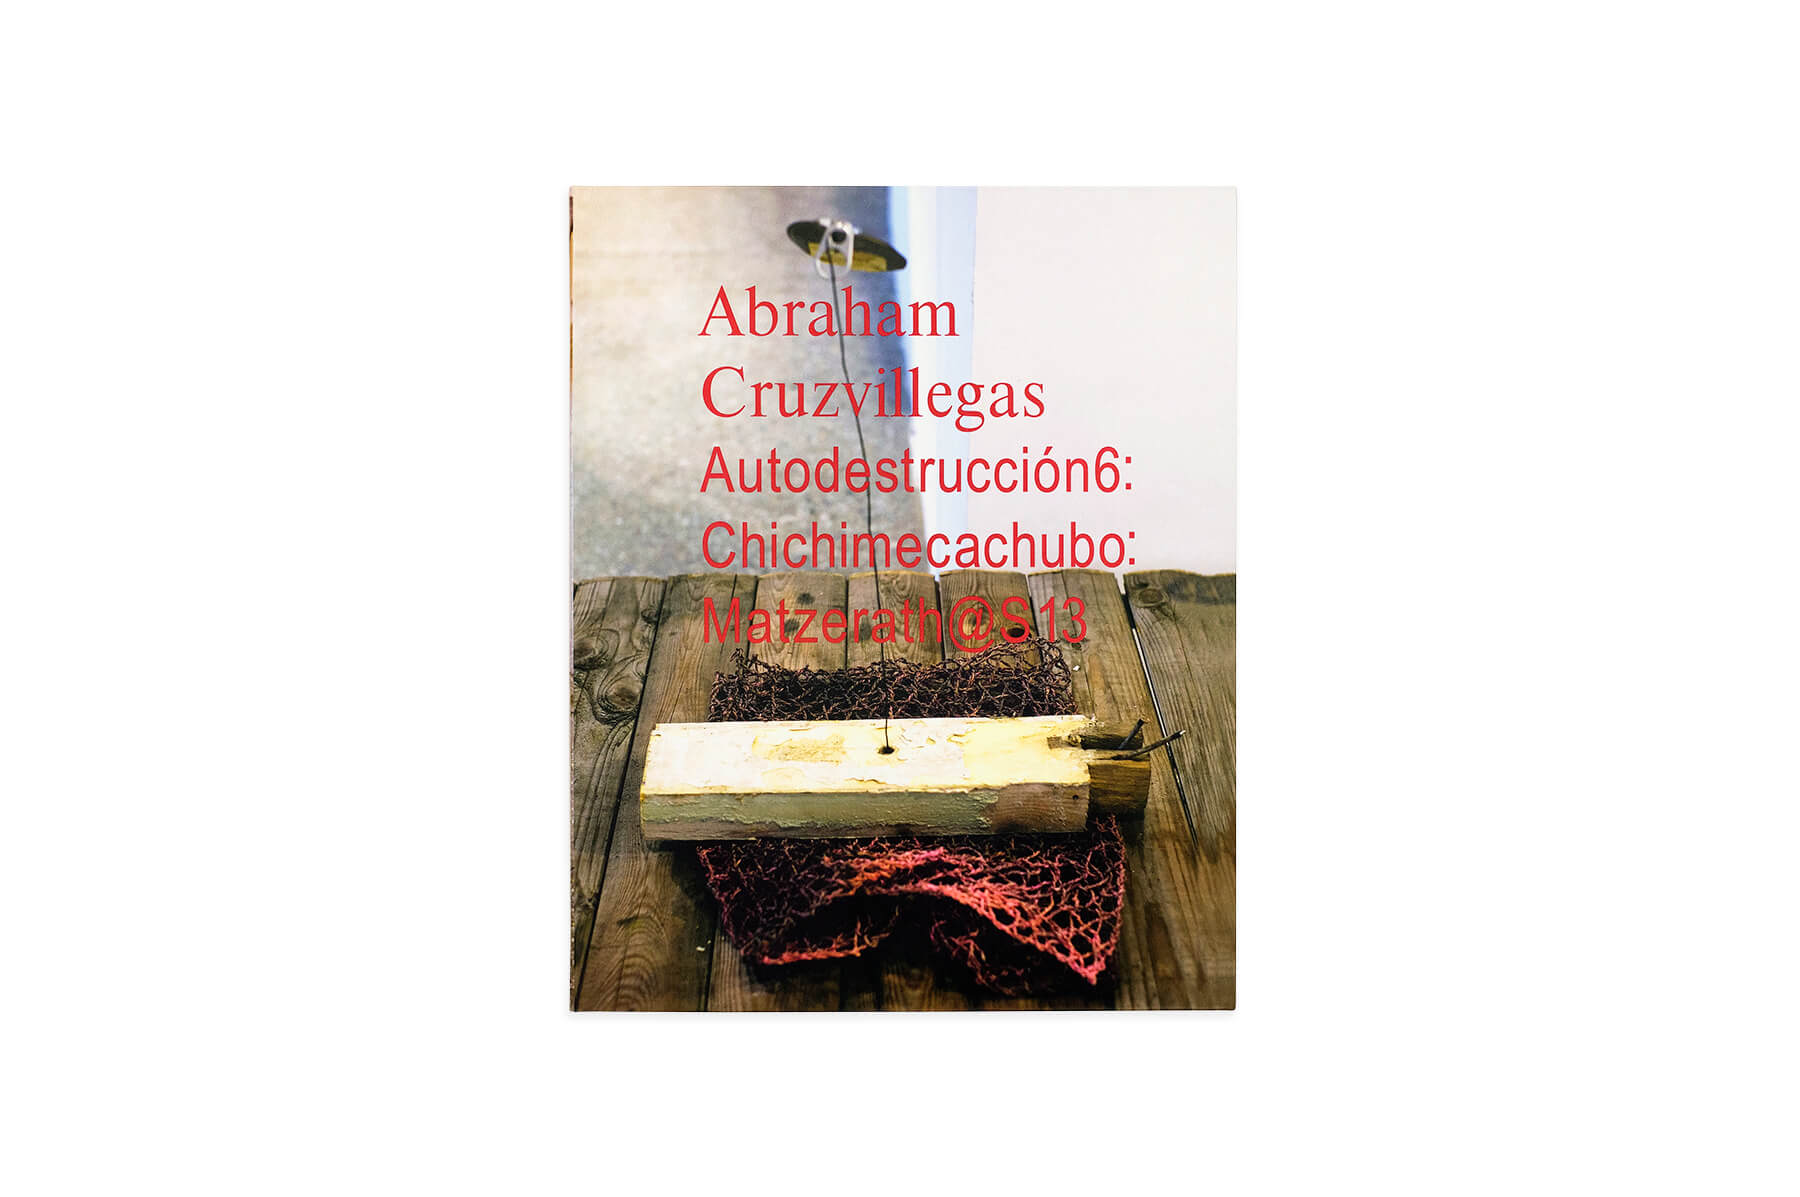 Product image of Autodestruccíon6: Chichimecachubo: Matzerath@S13